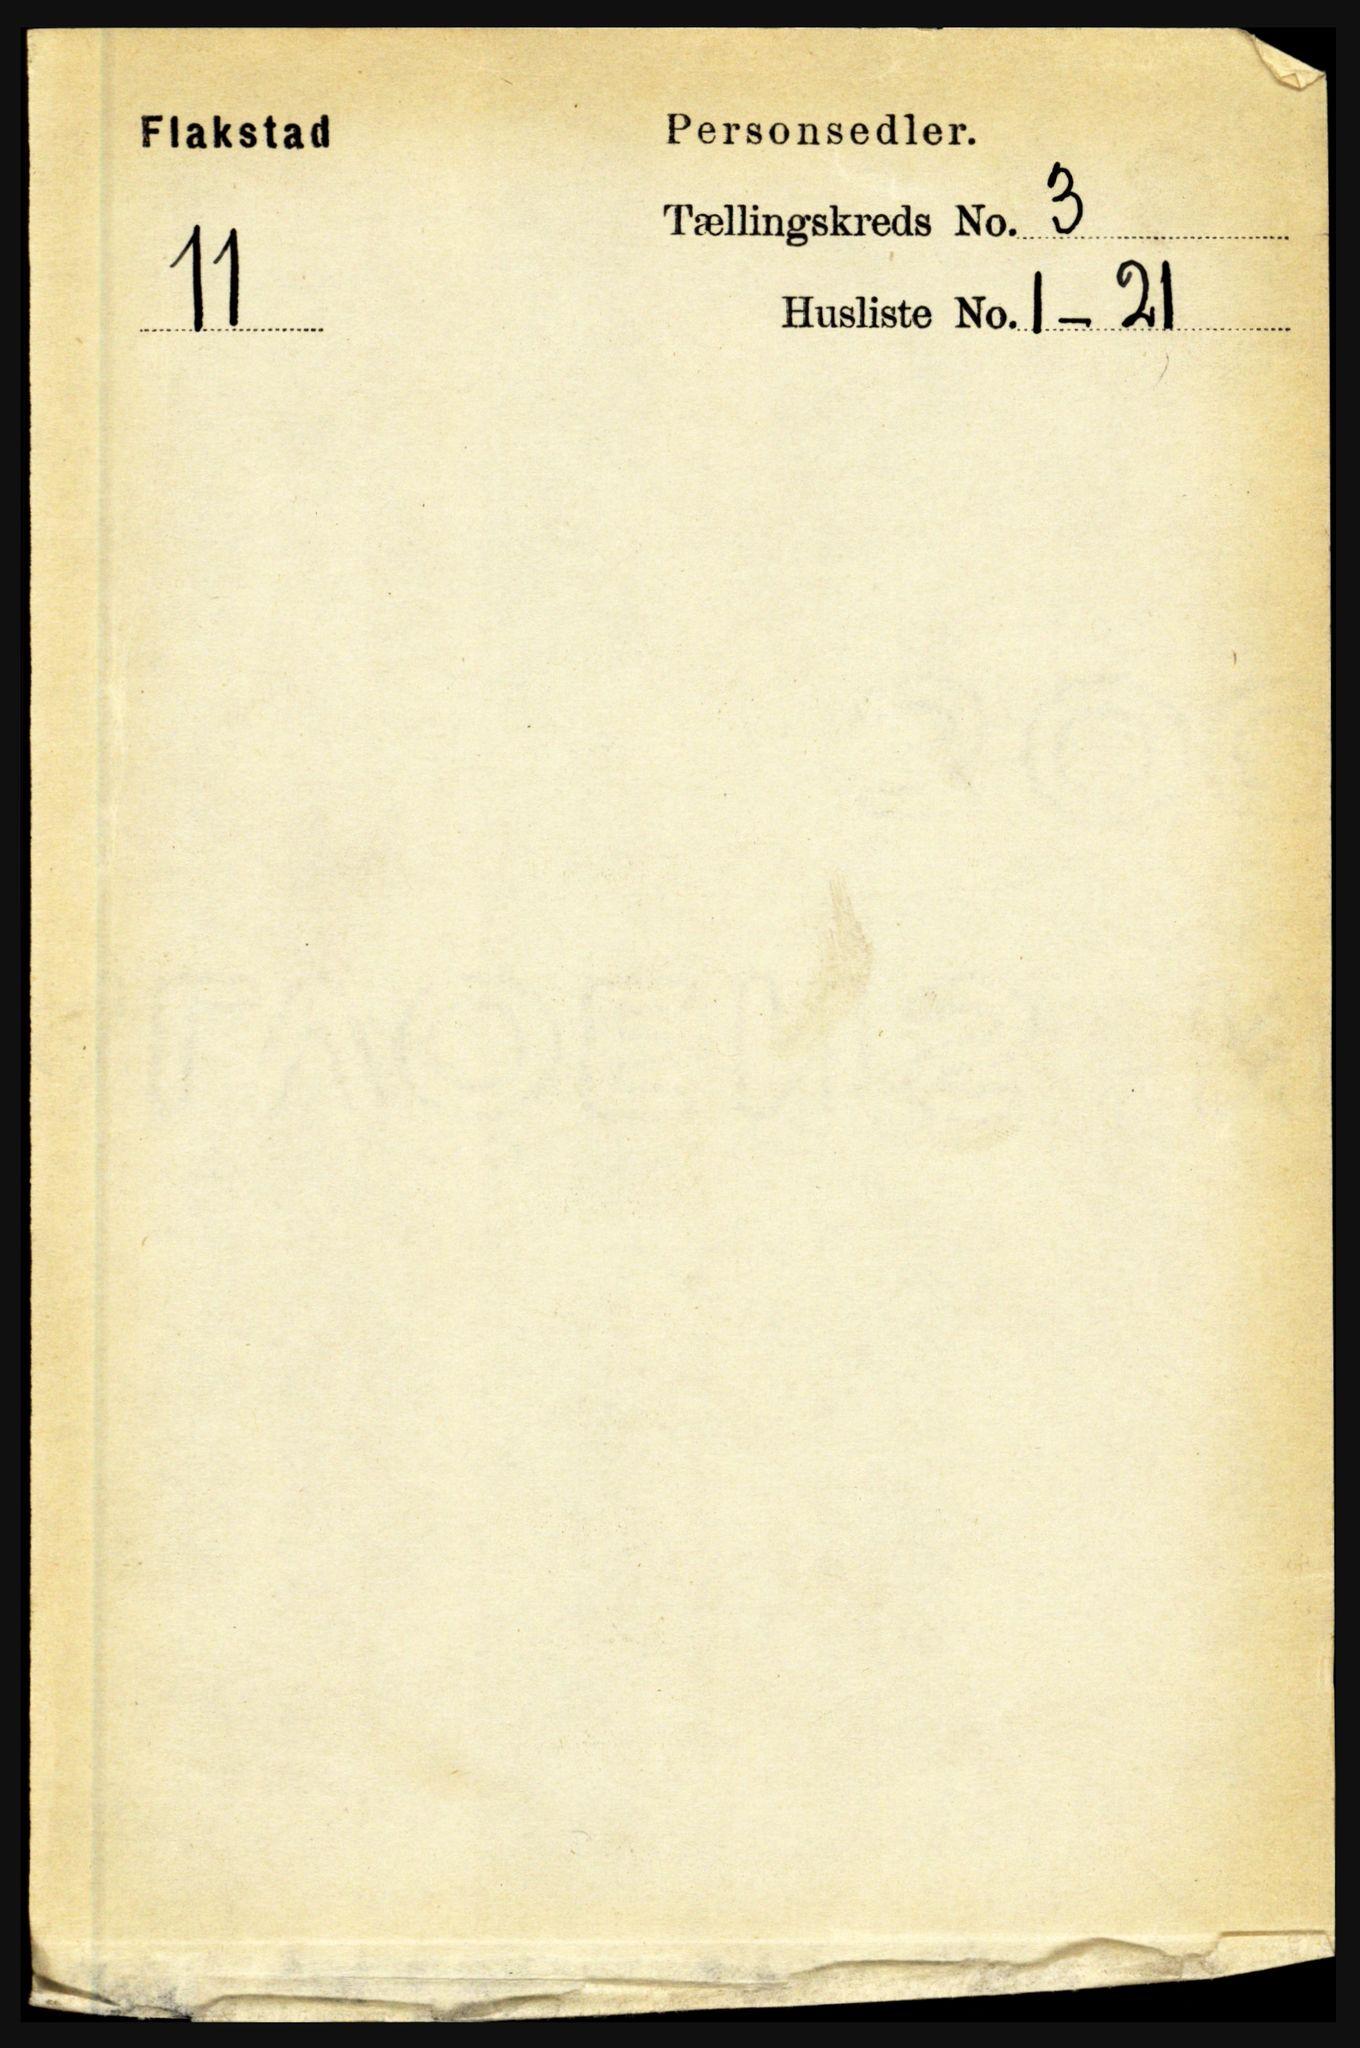 RA, Folketelling 1891 for 1859 Flakstad herred, 1891, s. 1298